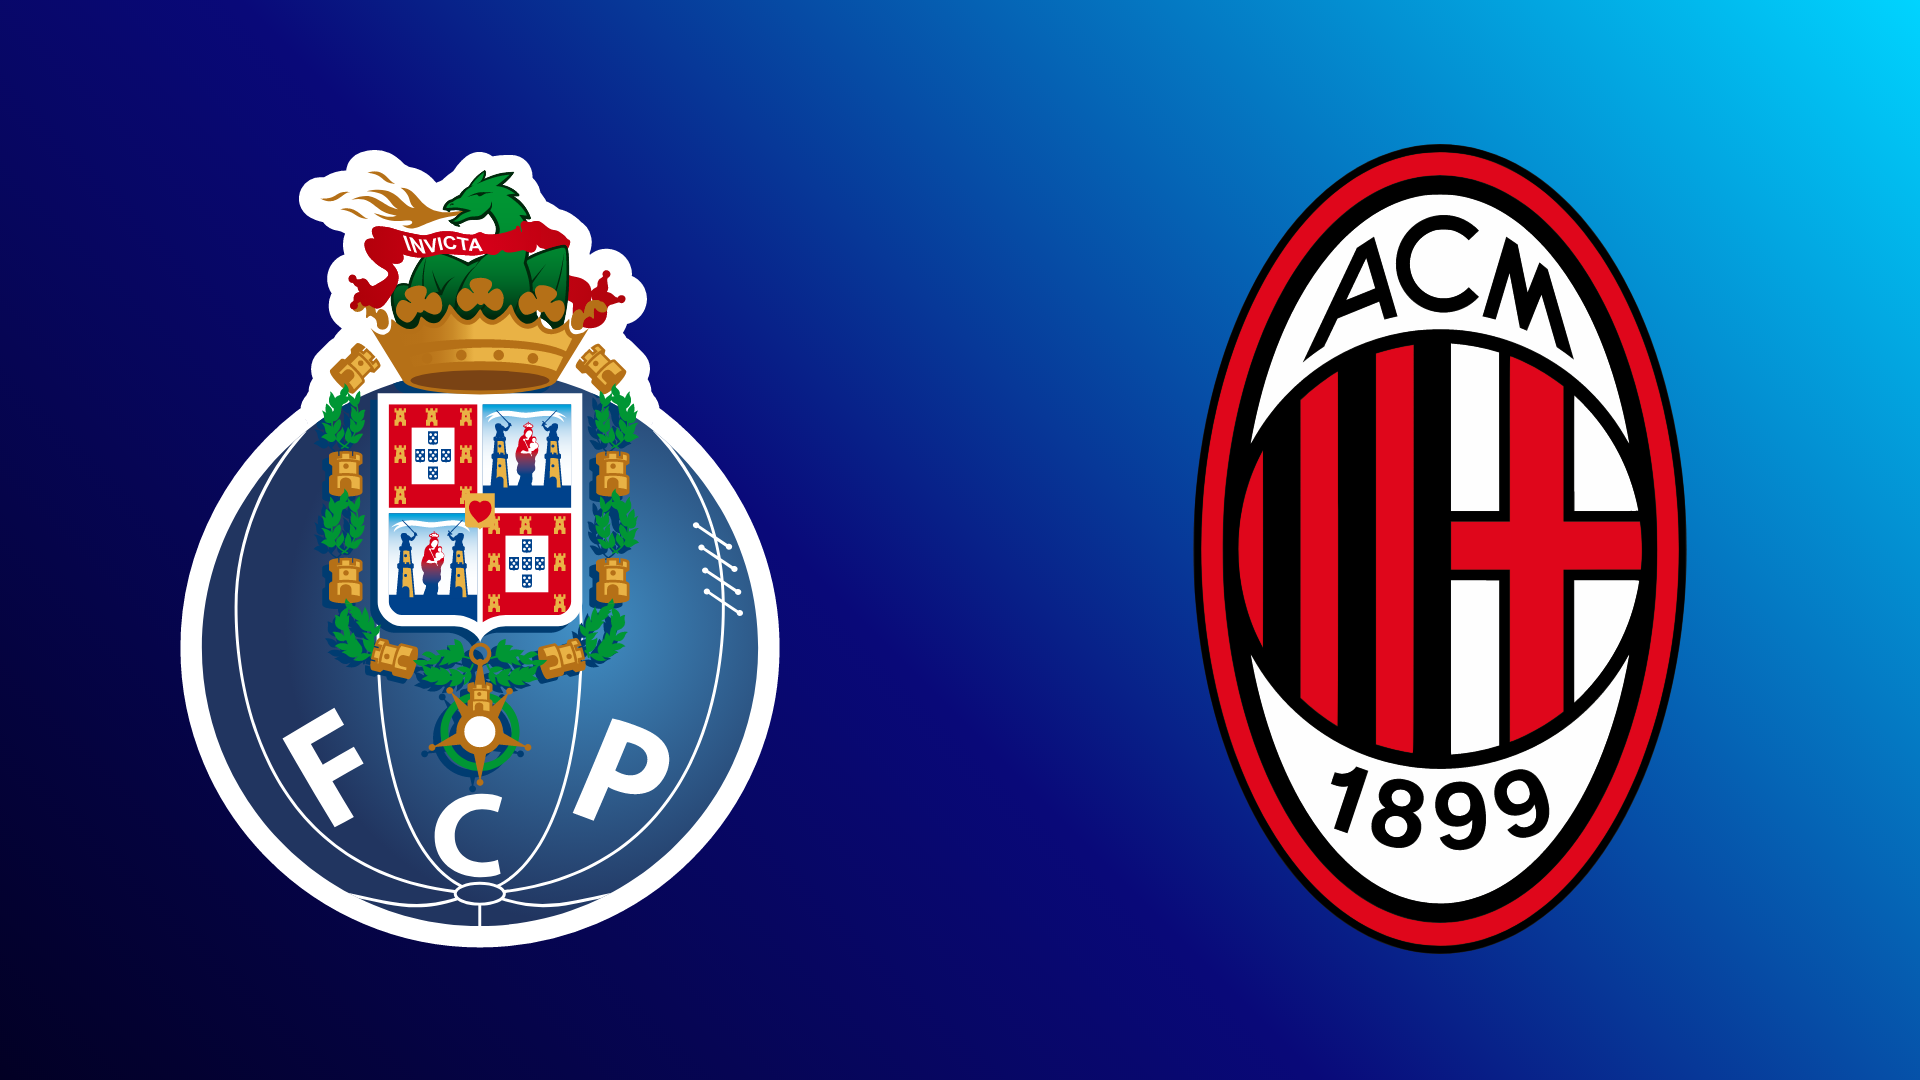 FC Porto - AC Mailand 19.10.2021 um 21:00 Uhr auf DAZN